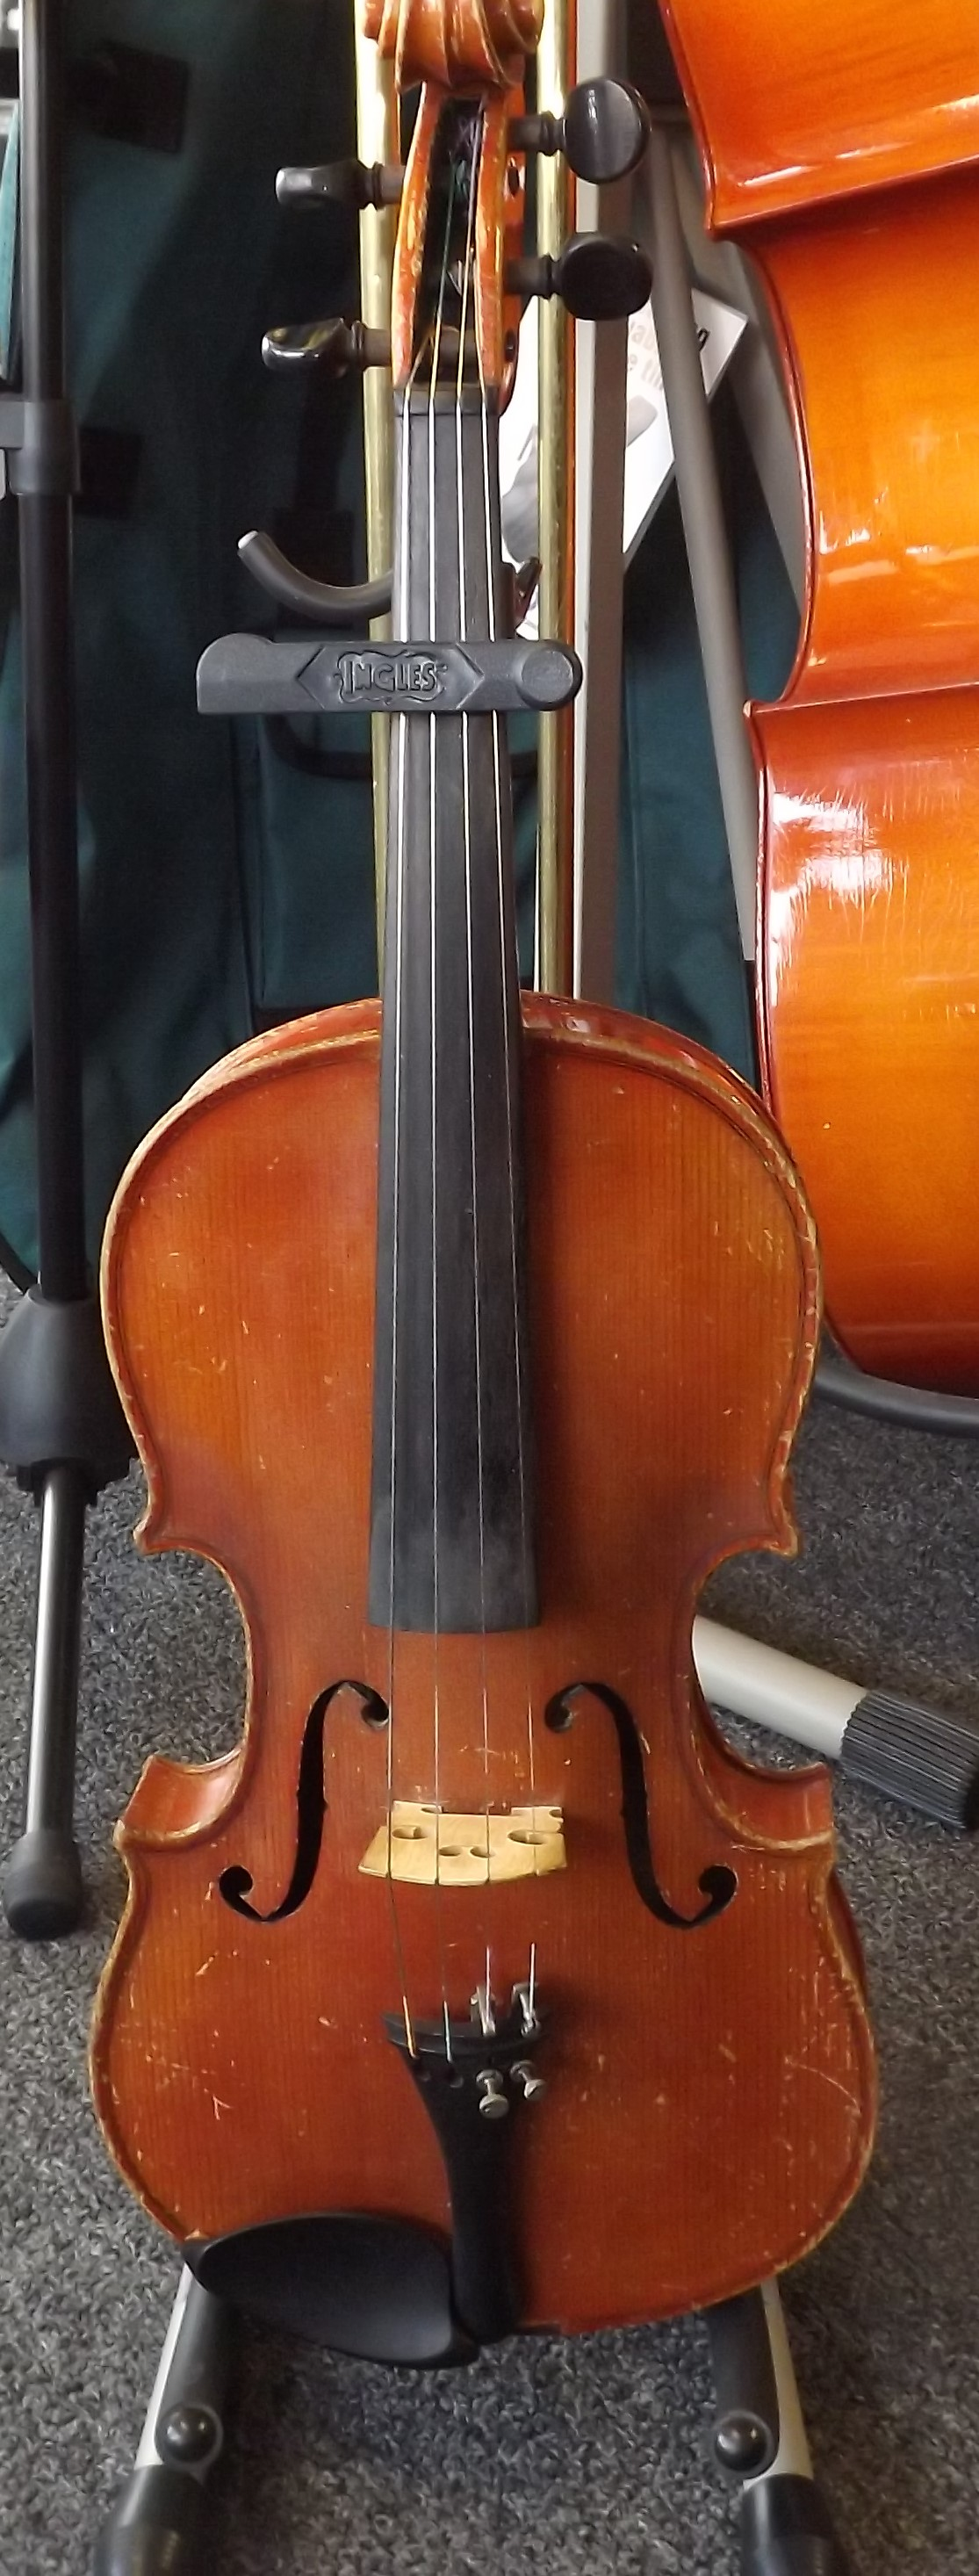 Antonius Stradavarius Cremonenlis 1924 4/4 Violin Made in Germany with Case